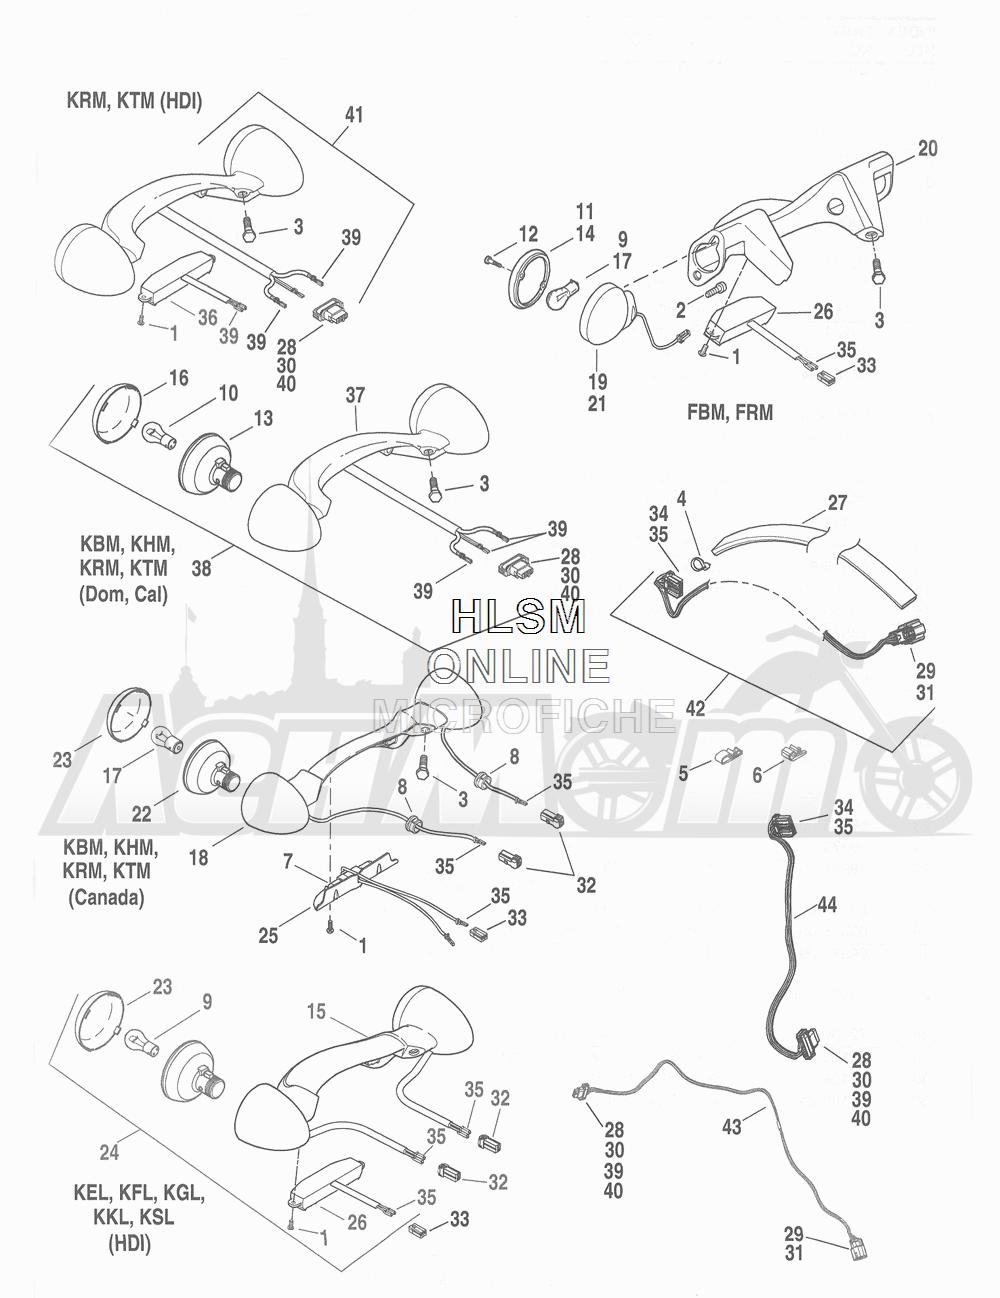 Запчасти для Мотоцикла Harley-Davidson 2016 FLHTCU 103 ULTRA CLASSIC ELECTRAGLIDE (FCM) Раздел: TURN SIGNALS - REAR W/ TAIL LIGHT - REAR | сигналы поворота зад вместе с задний фонарь зад